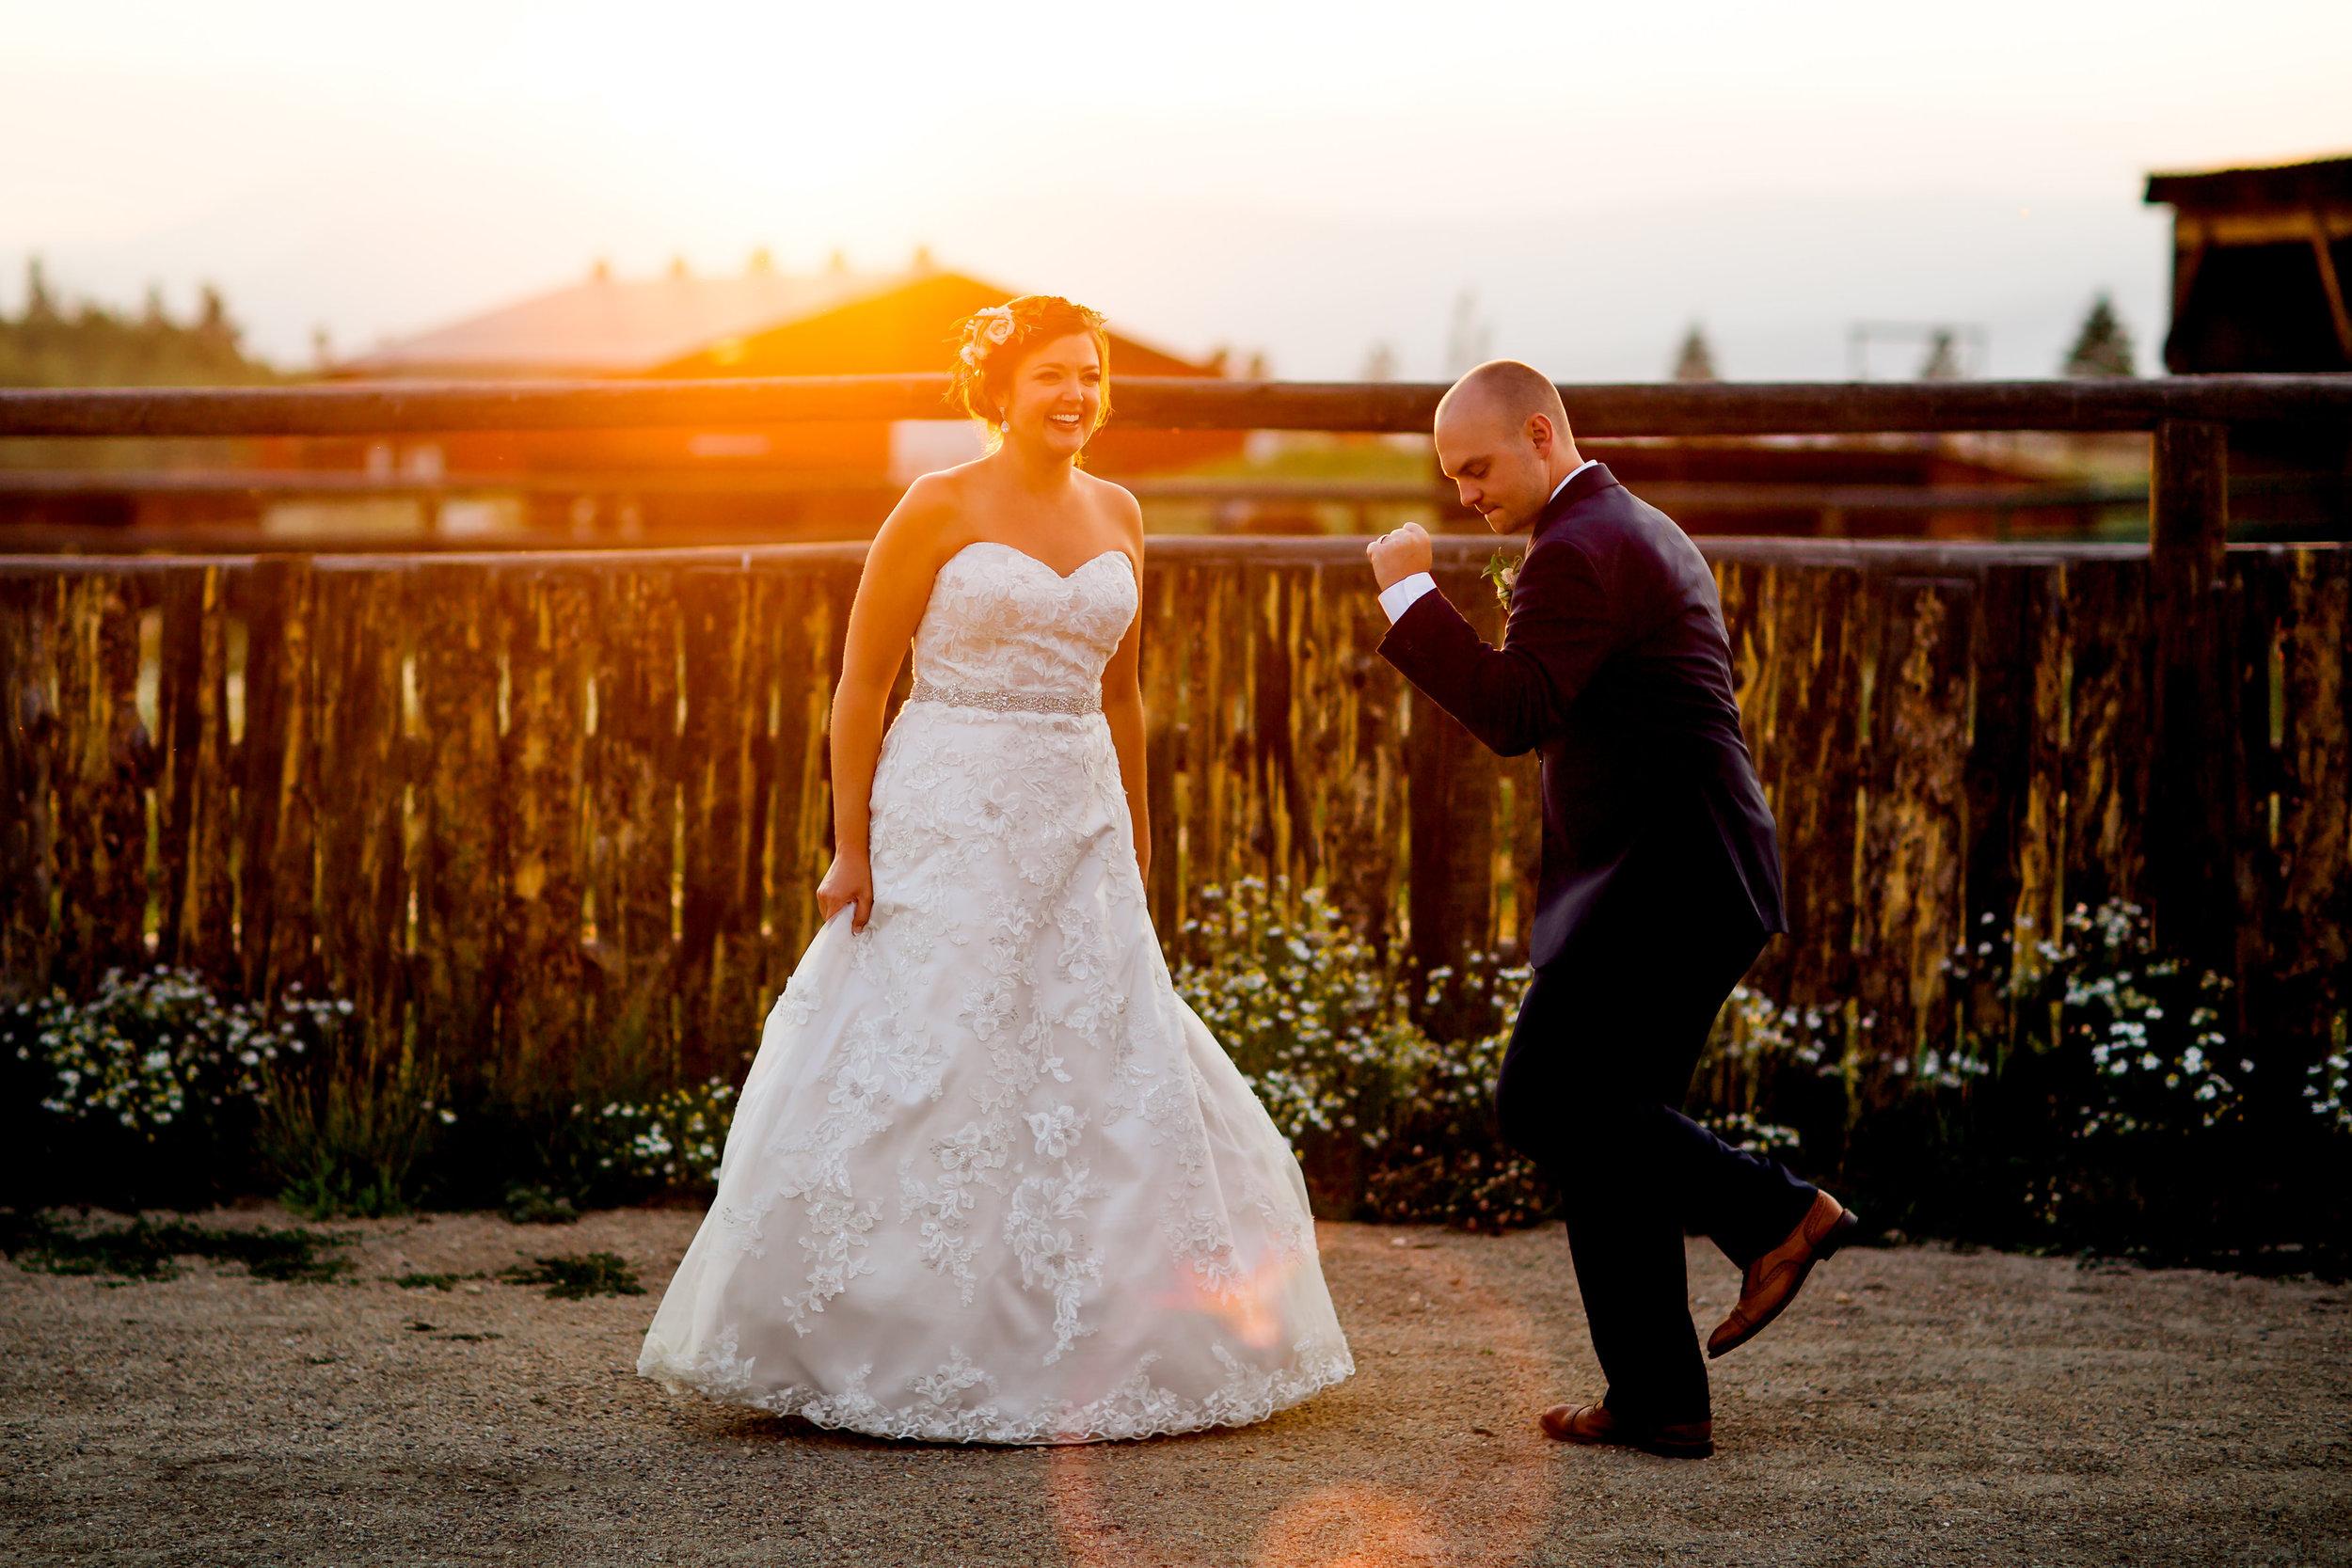 kaitlin_kurt_bridegroomportraits-105